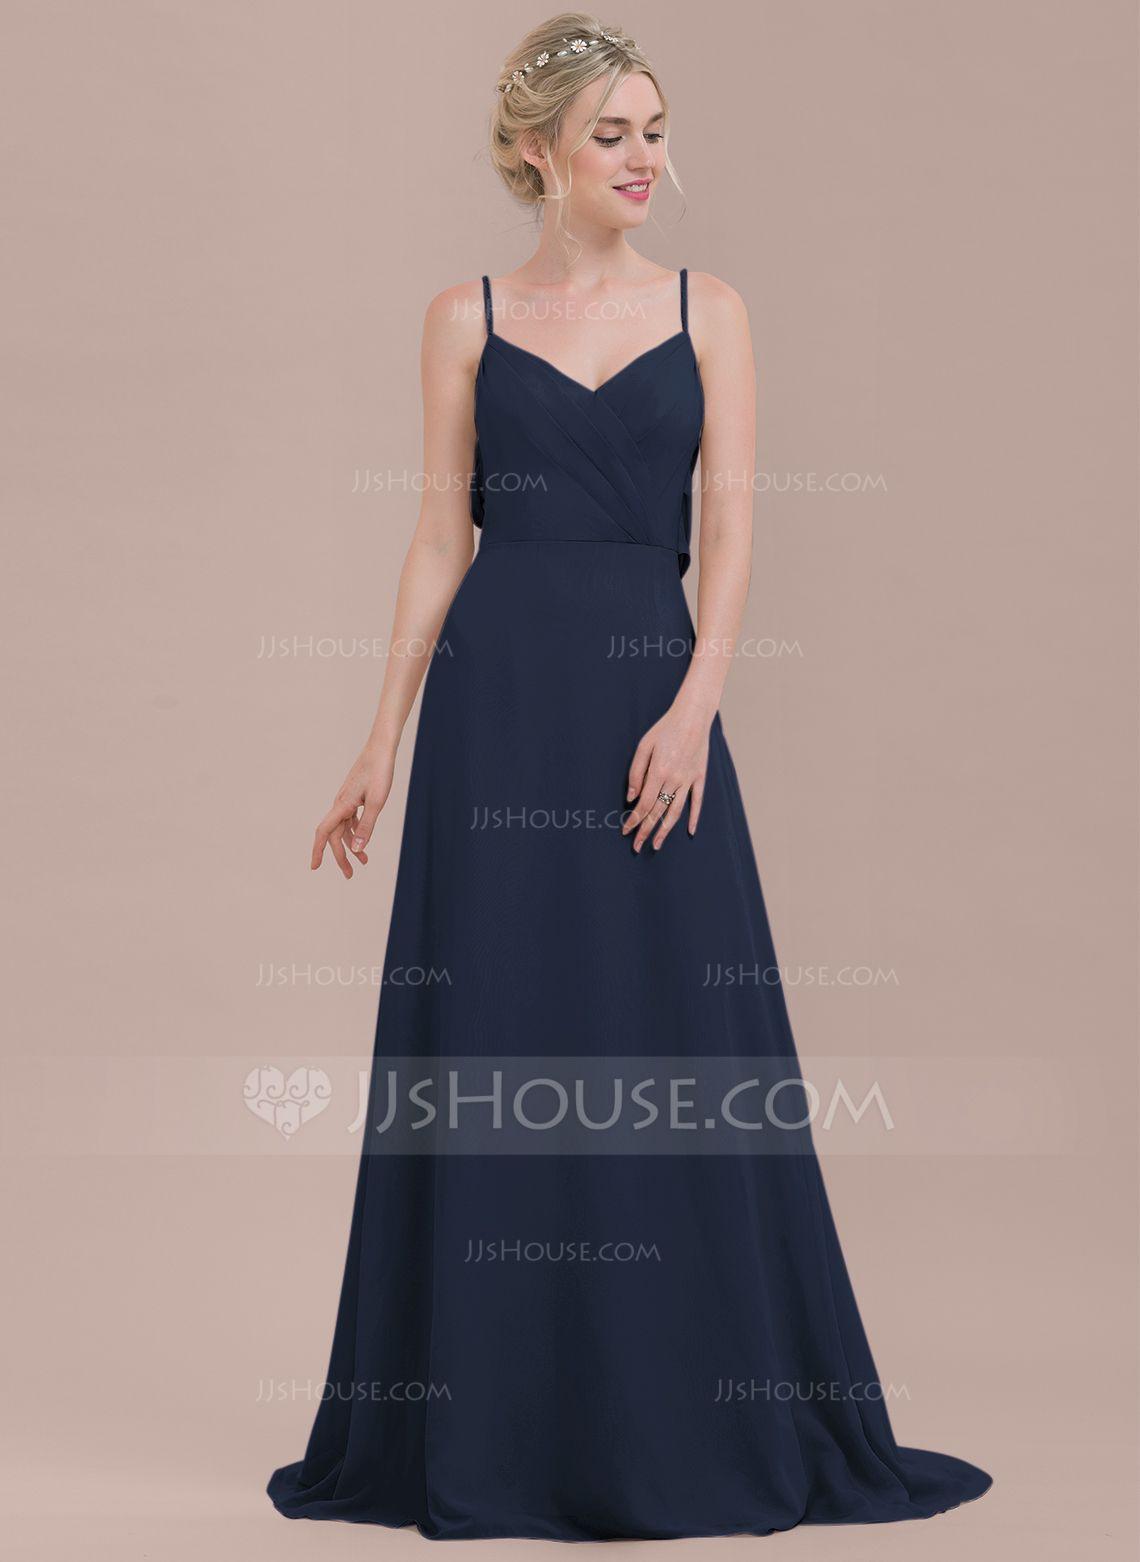 10 Kreativ Abendkleid Xxl Günstig VertriebDesigner Wunderbar Abendkleid Xxl Günstig Design